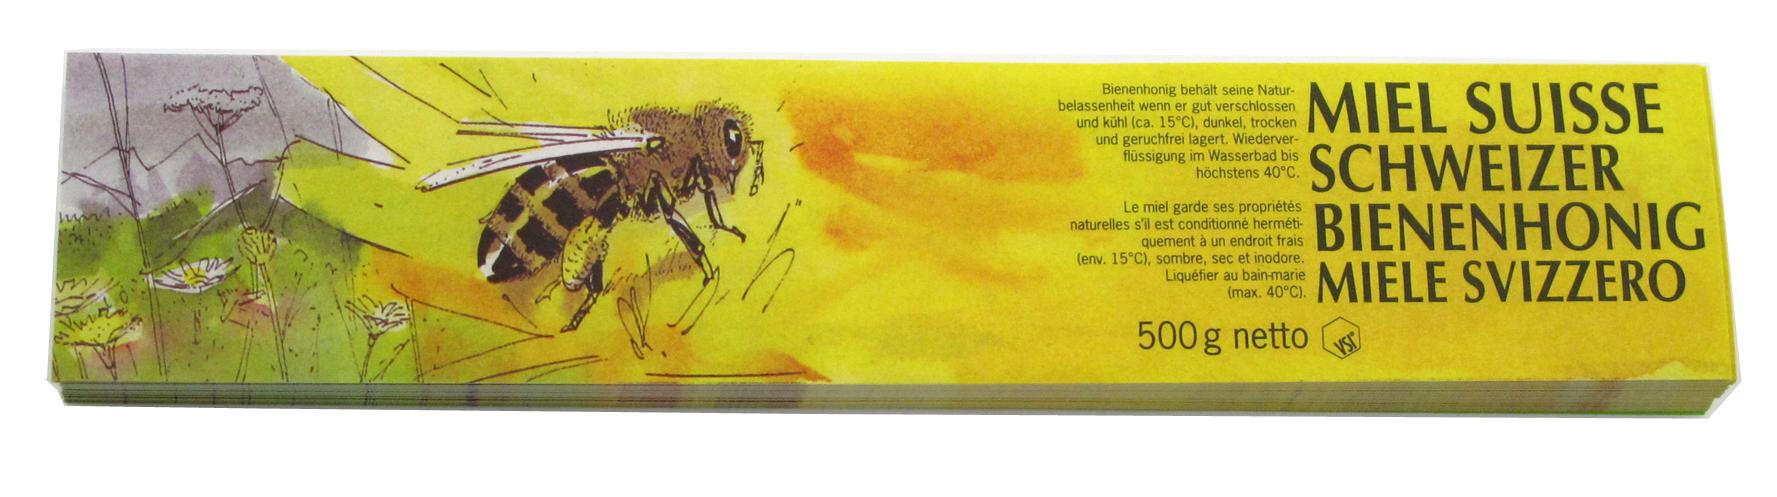 VSI Honig Etiketten 500 g gelb